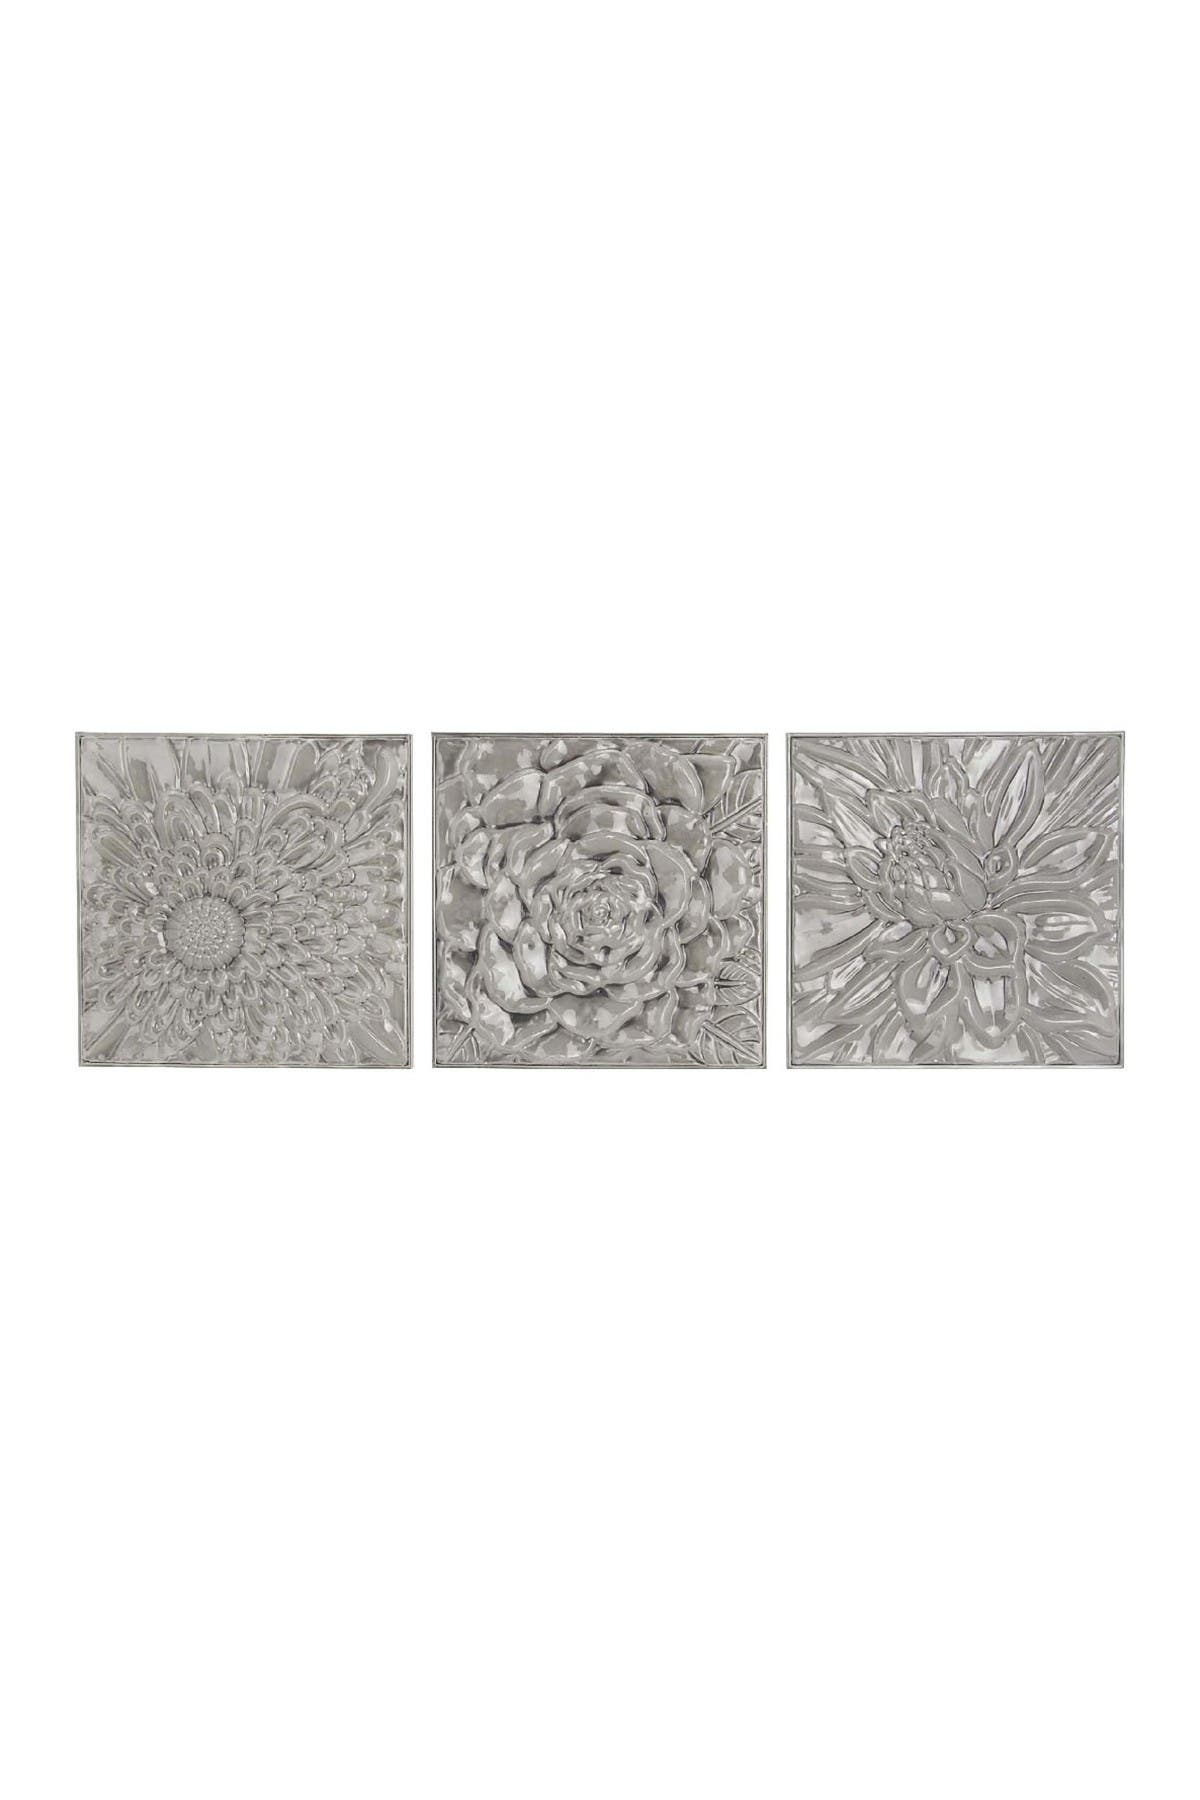 Image of Willow Row Grey Contemporary Glazed Iron Wall Decor - Set of 3